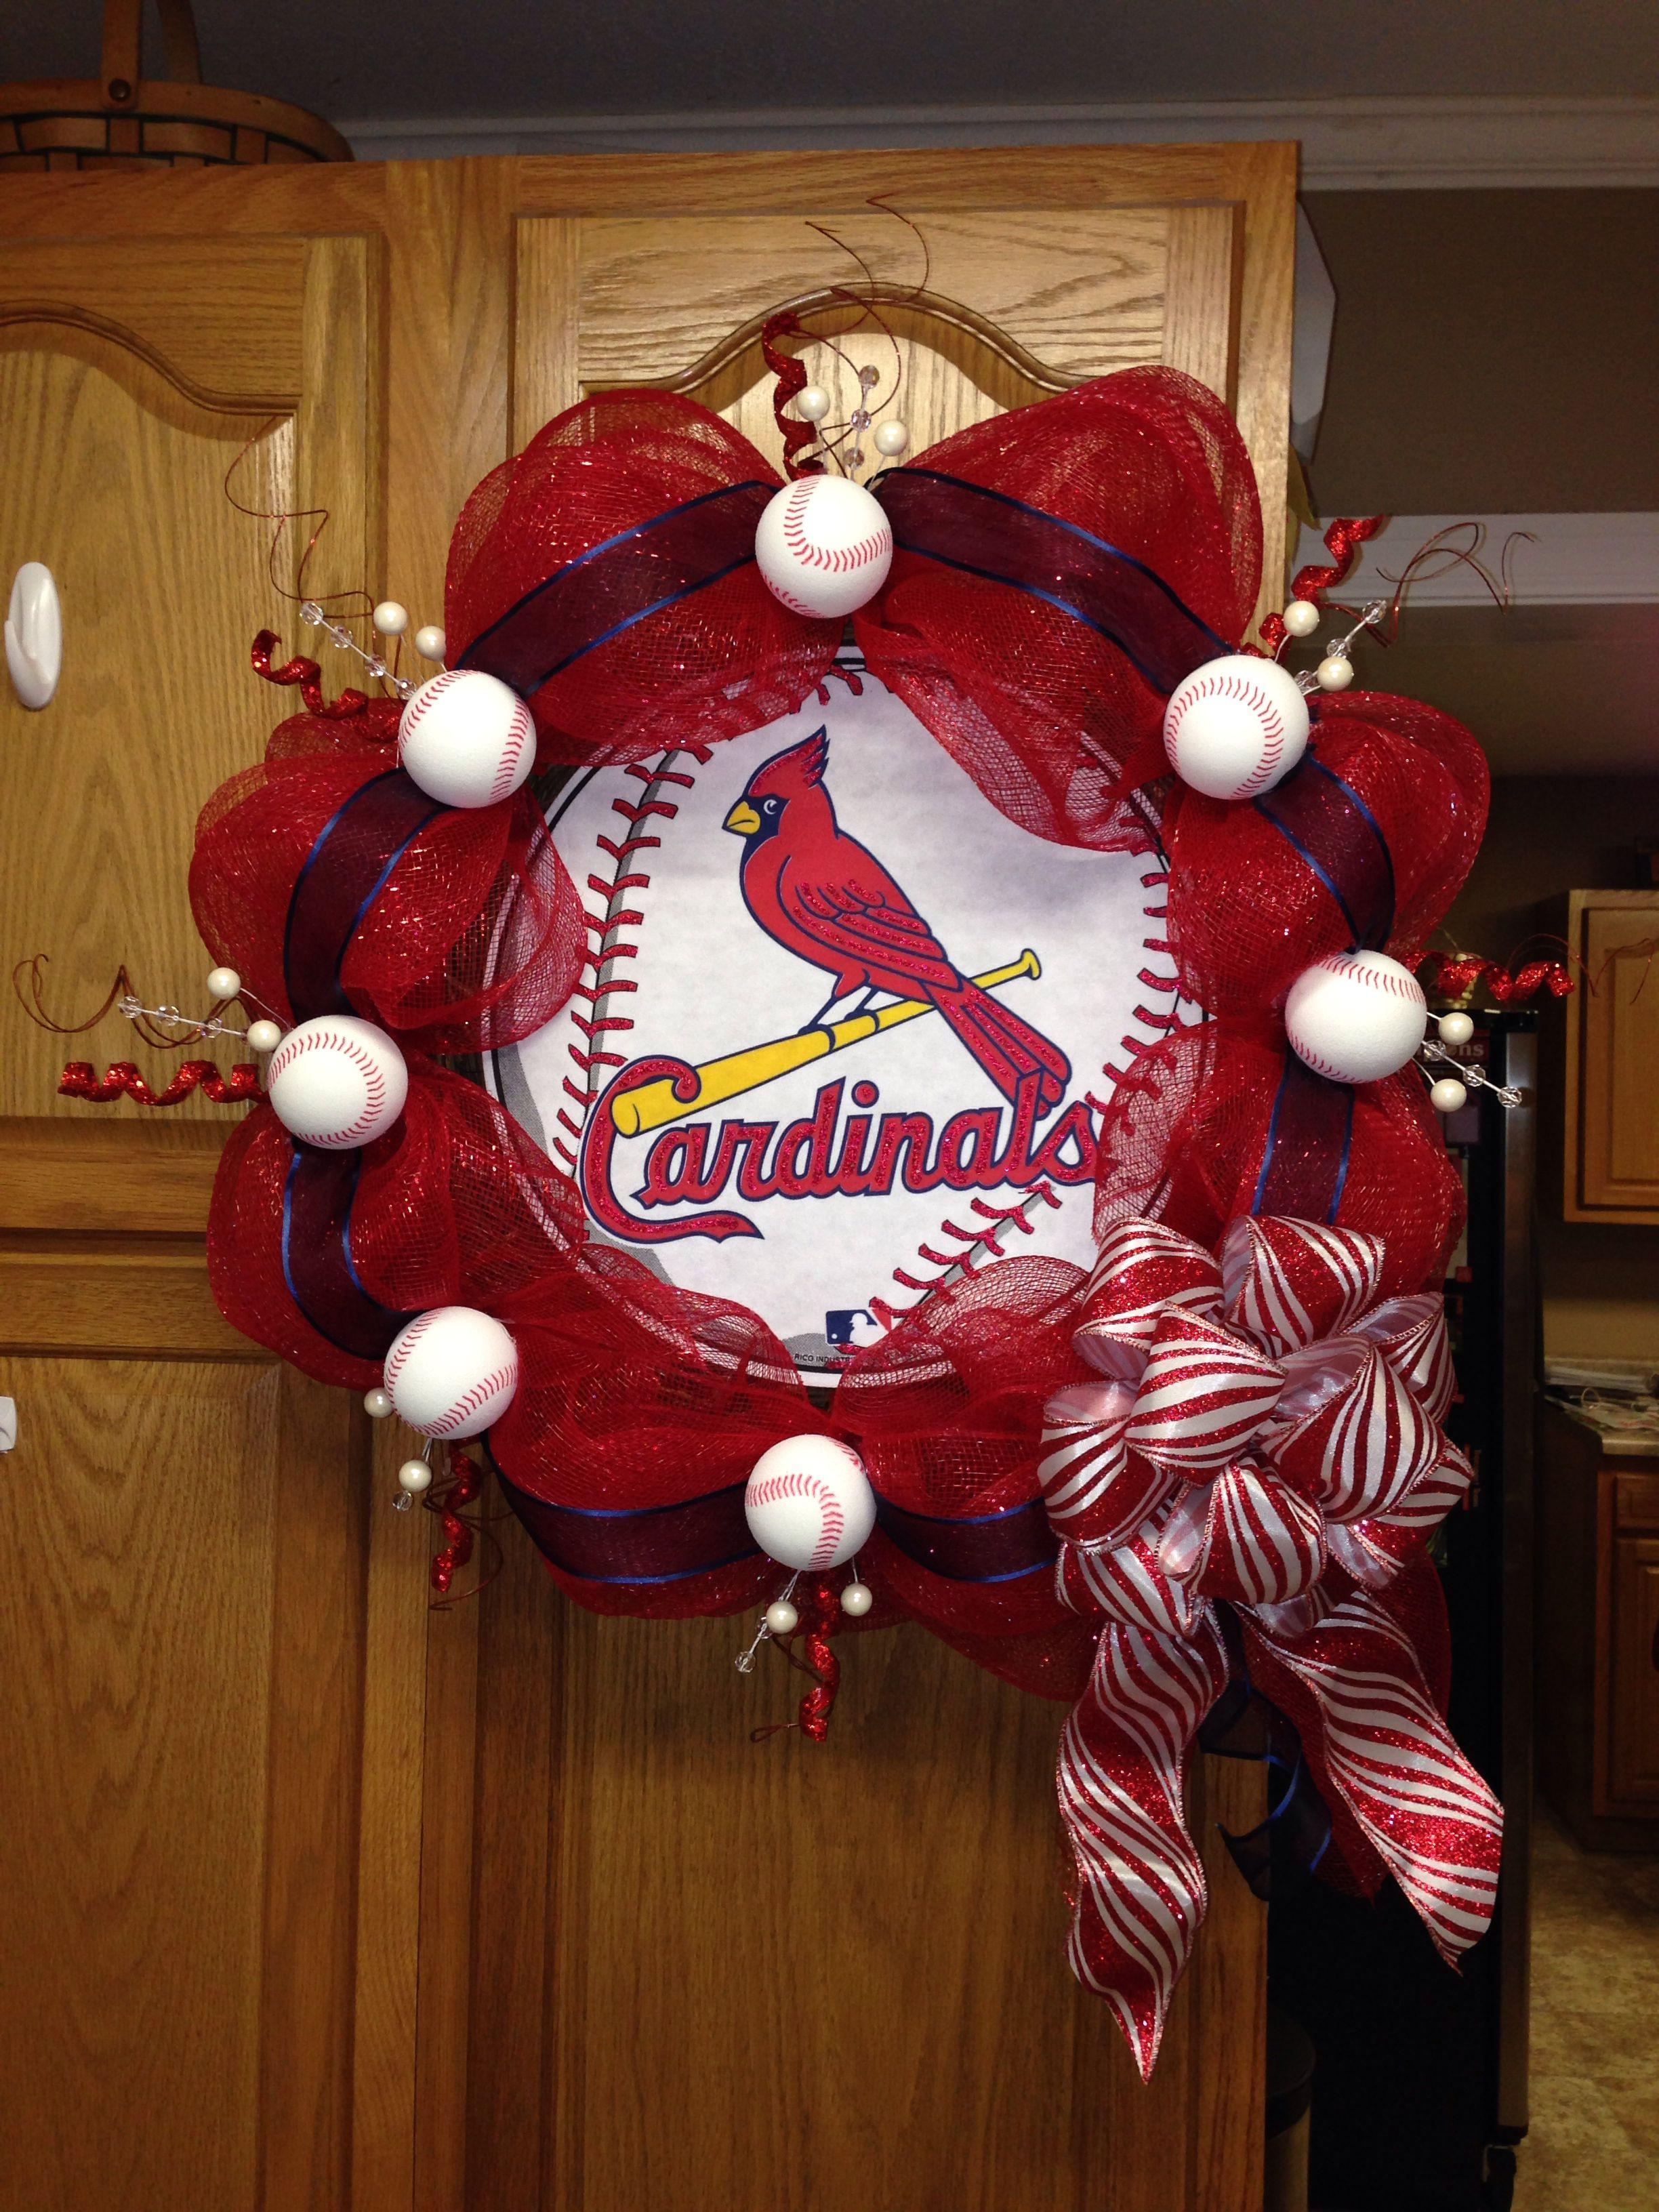 Deco Mesh St Louis Cardinals Wreath October 2013 Baseball